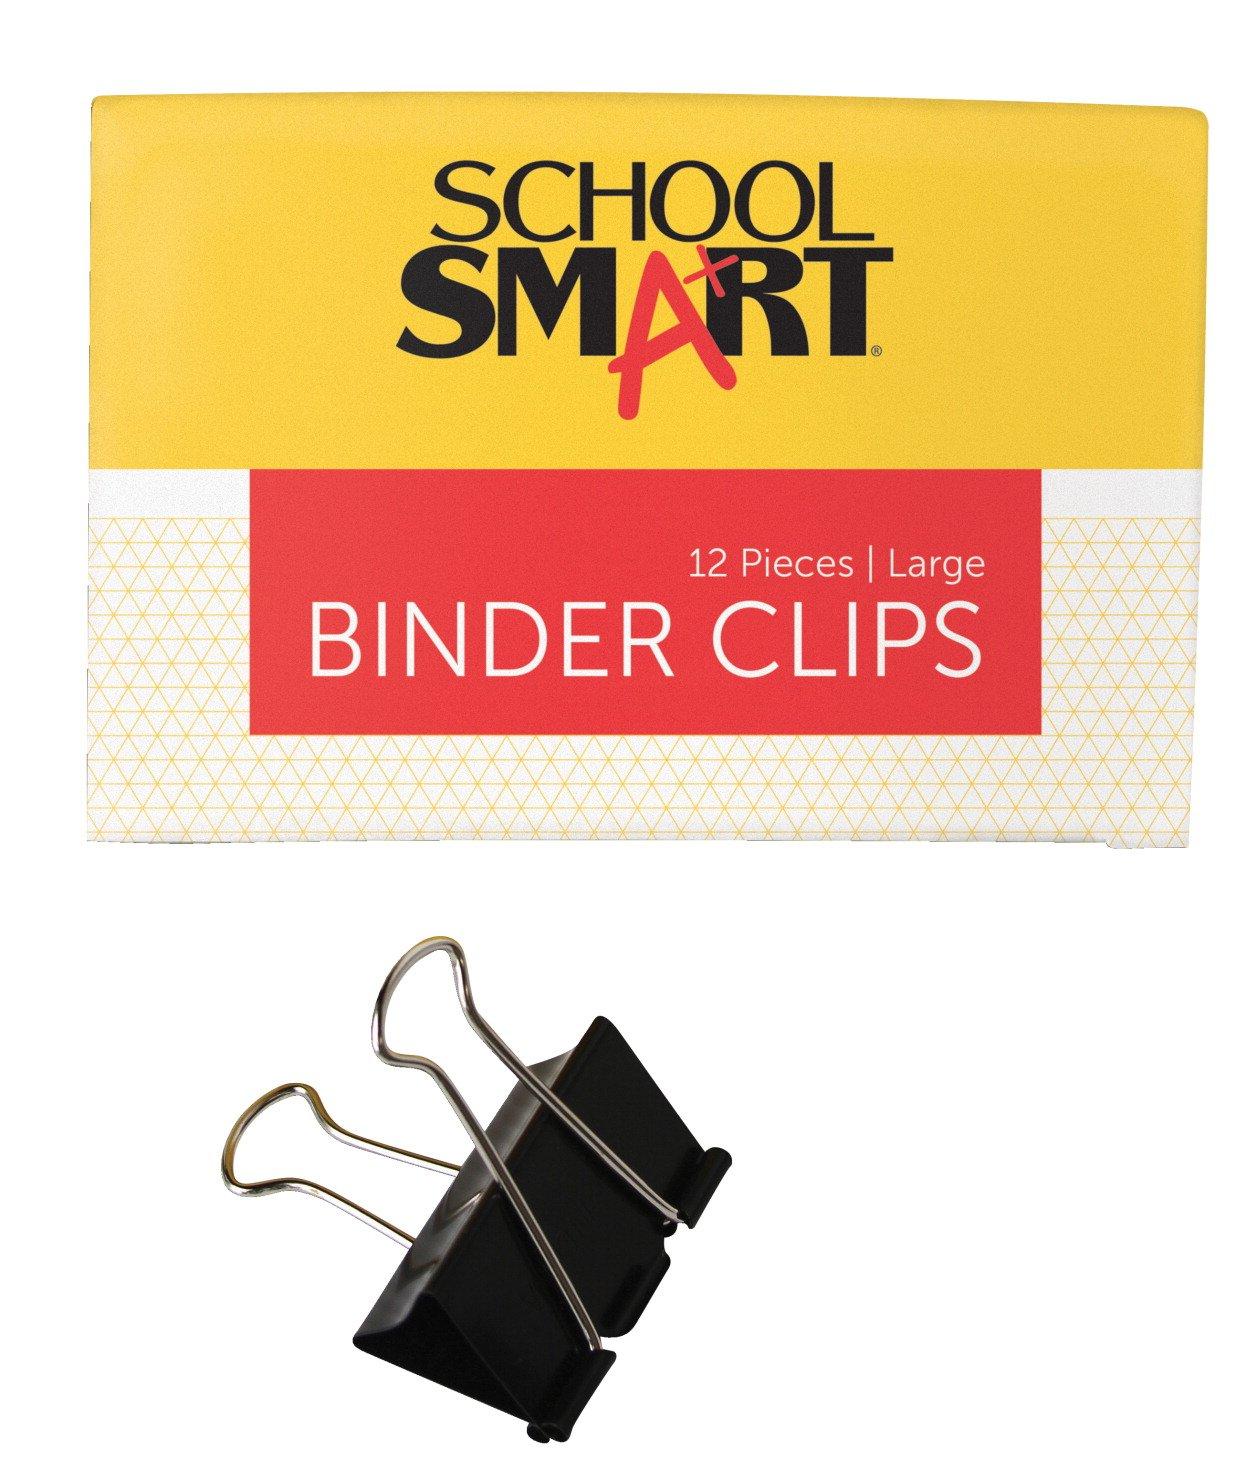 School Smart Binder Clips - Large - Pack of 12